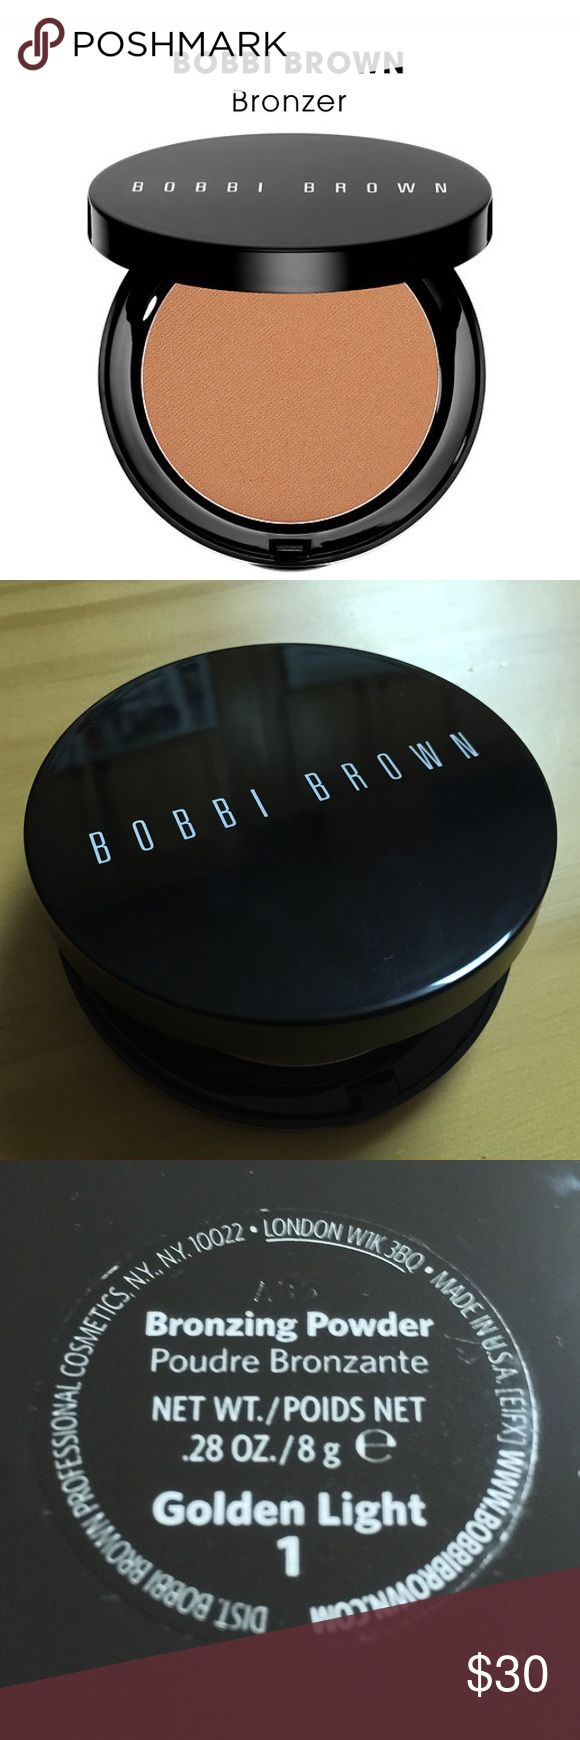 Bobbi Brown - Bronzer - Golden Light - light tan Brand new. No box. Never used. Bobbi Brown Makeup Bronzer